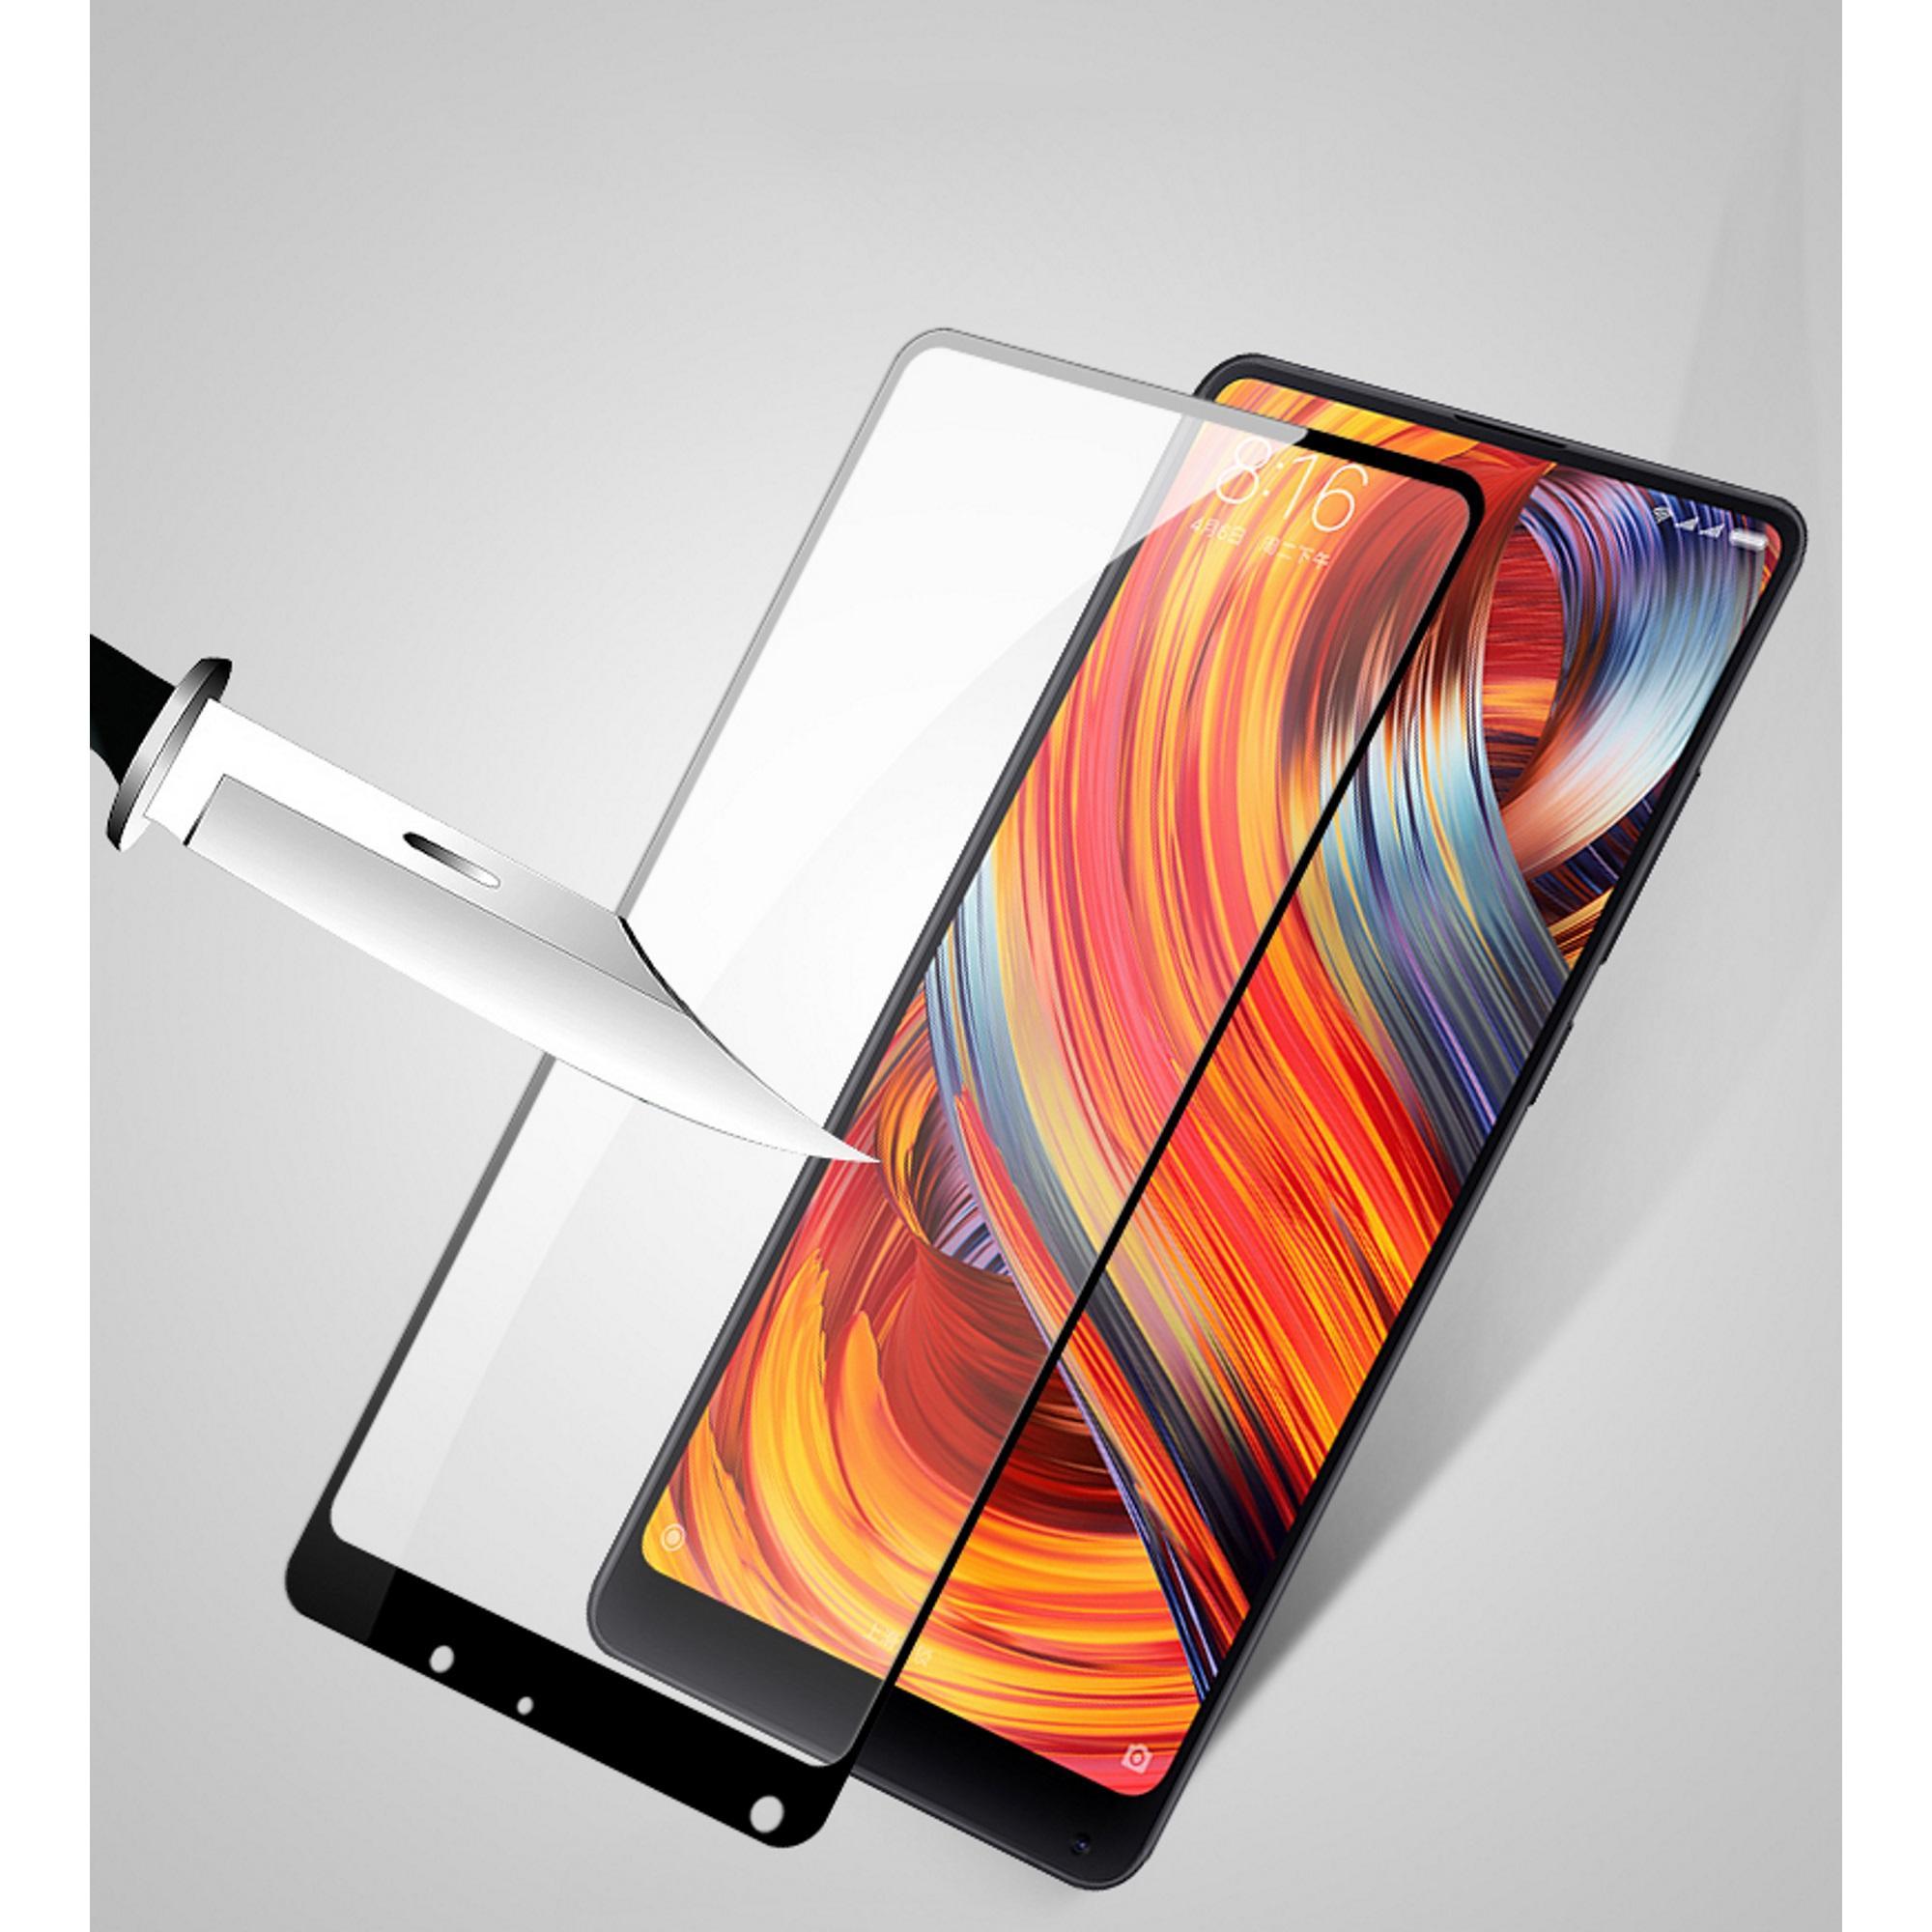 ... Premium 5D Full Screen Tempered Glass Curved Screen Protector for Xiaomi Mi Mix 2 (Black ...